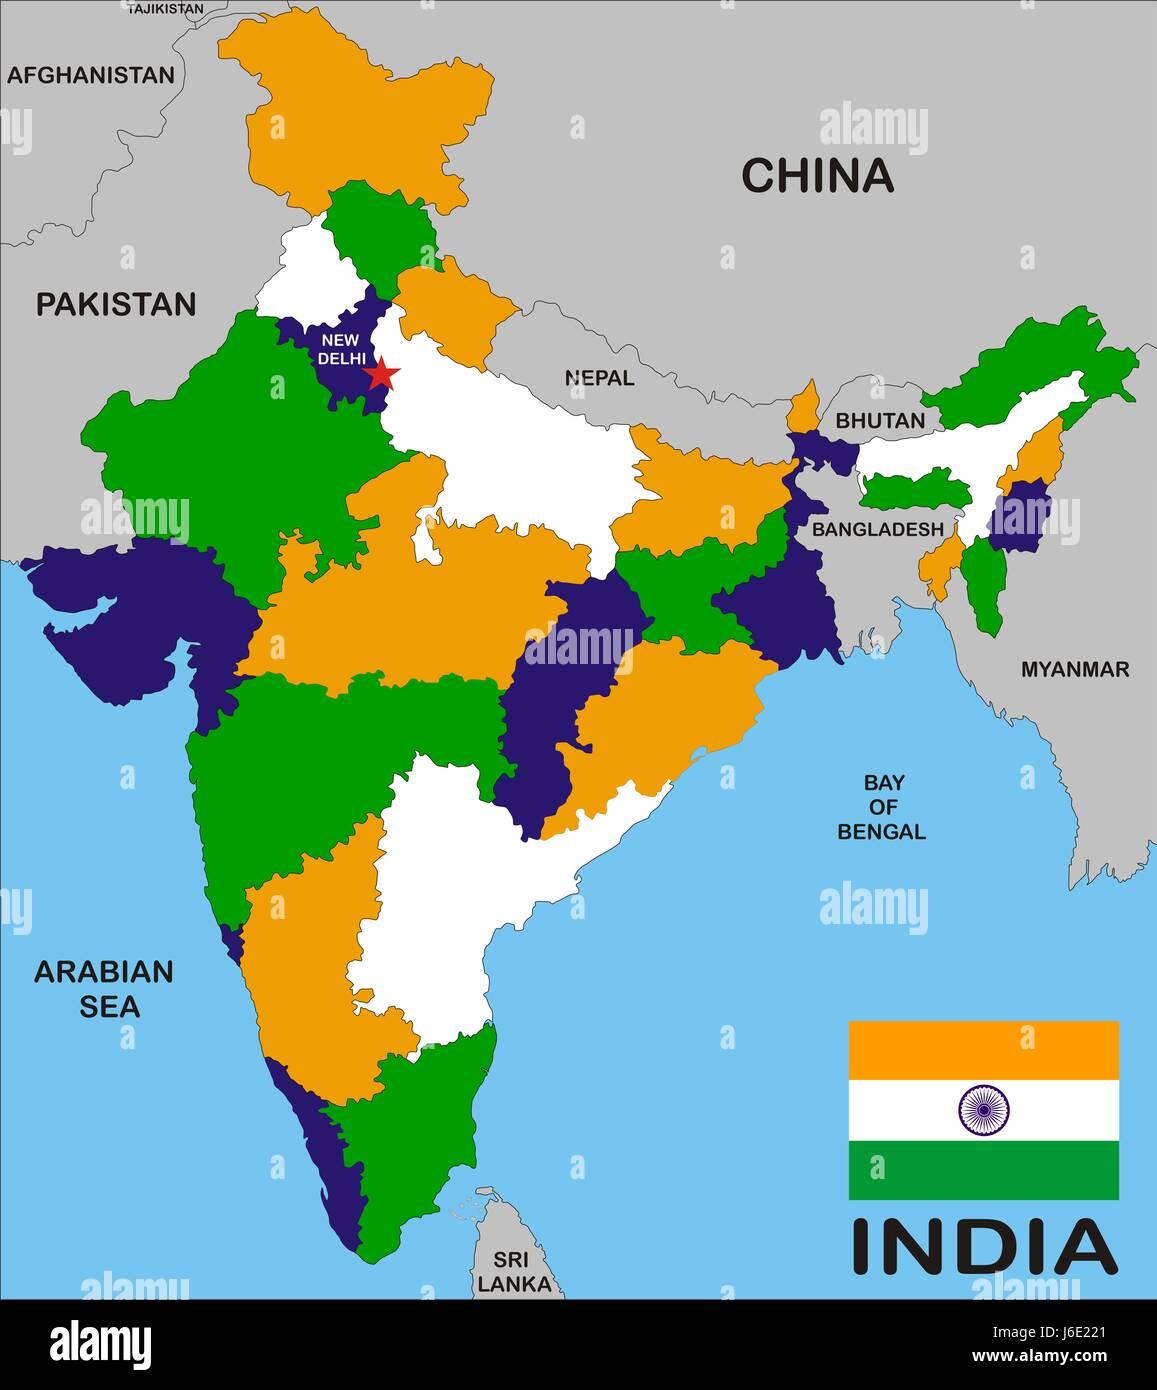 Cartina India Hd.Mappa India Immagini Mappa India Fotos Stock Alamy